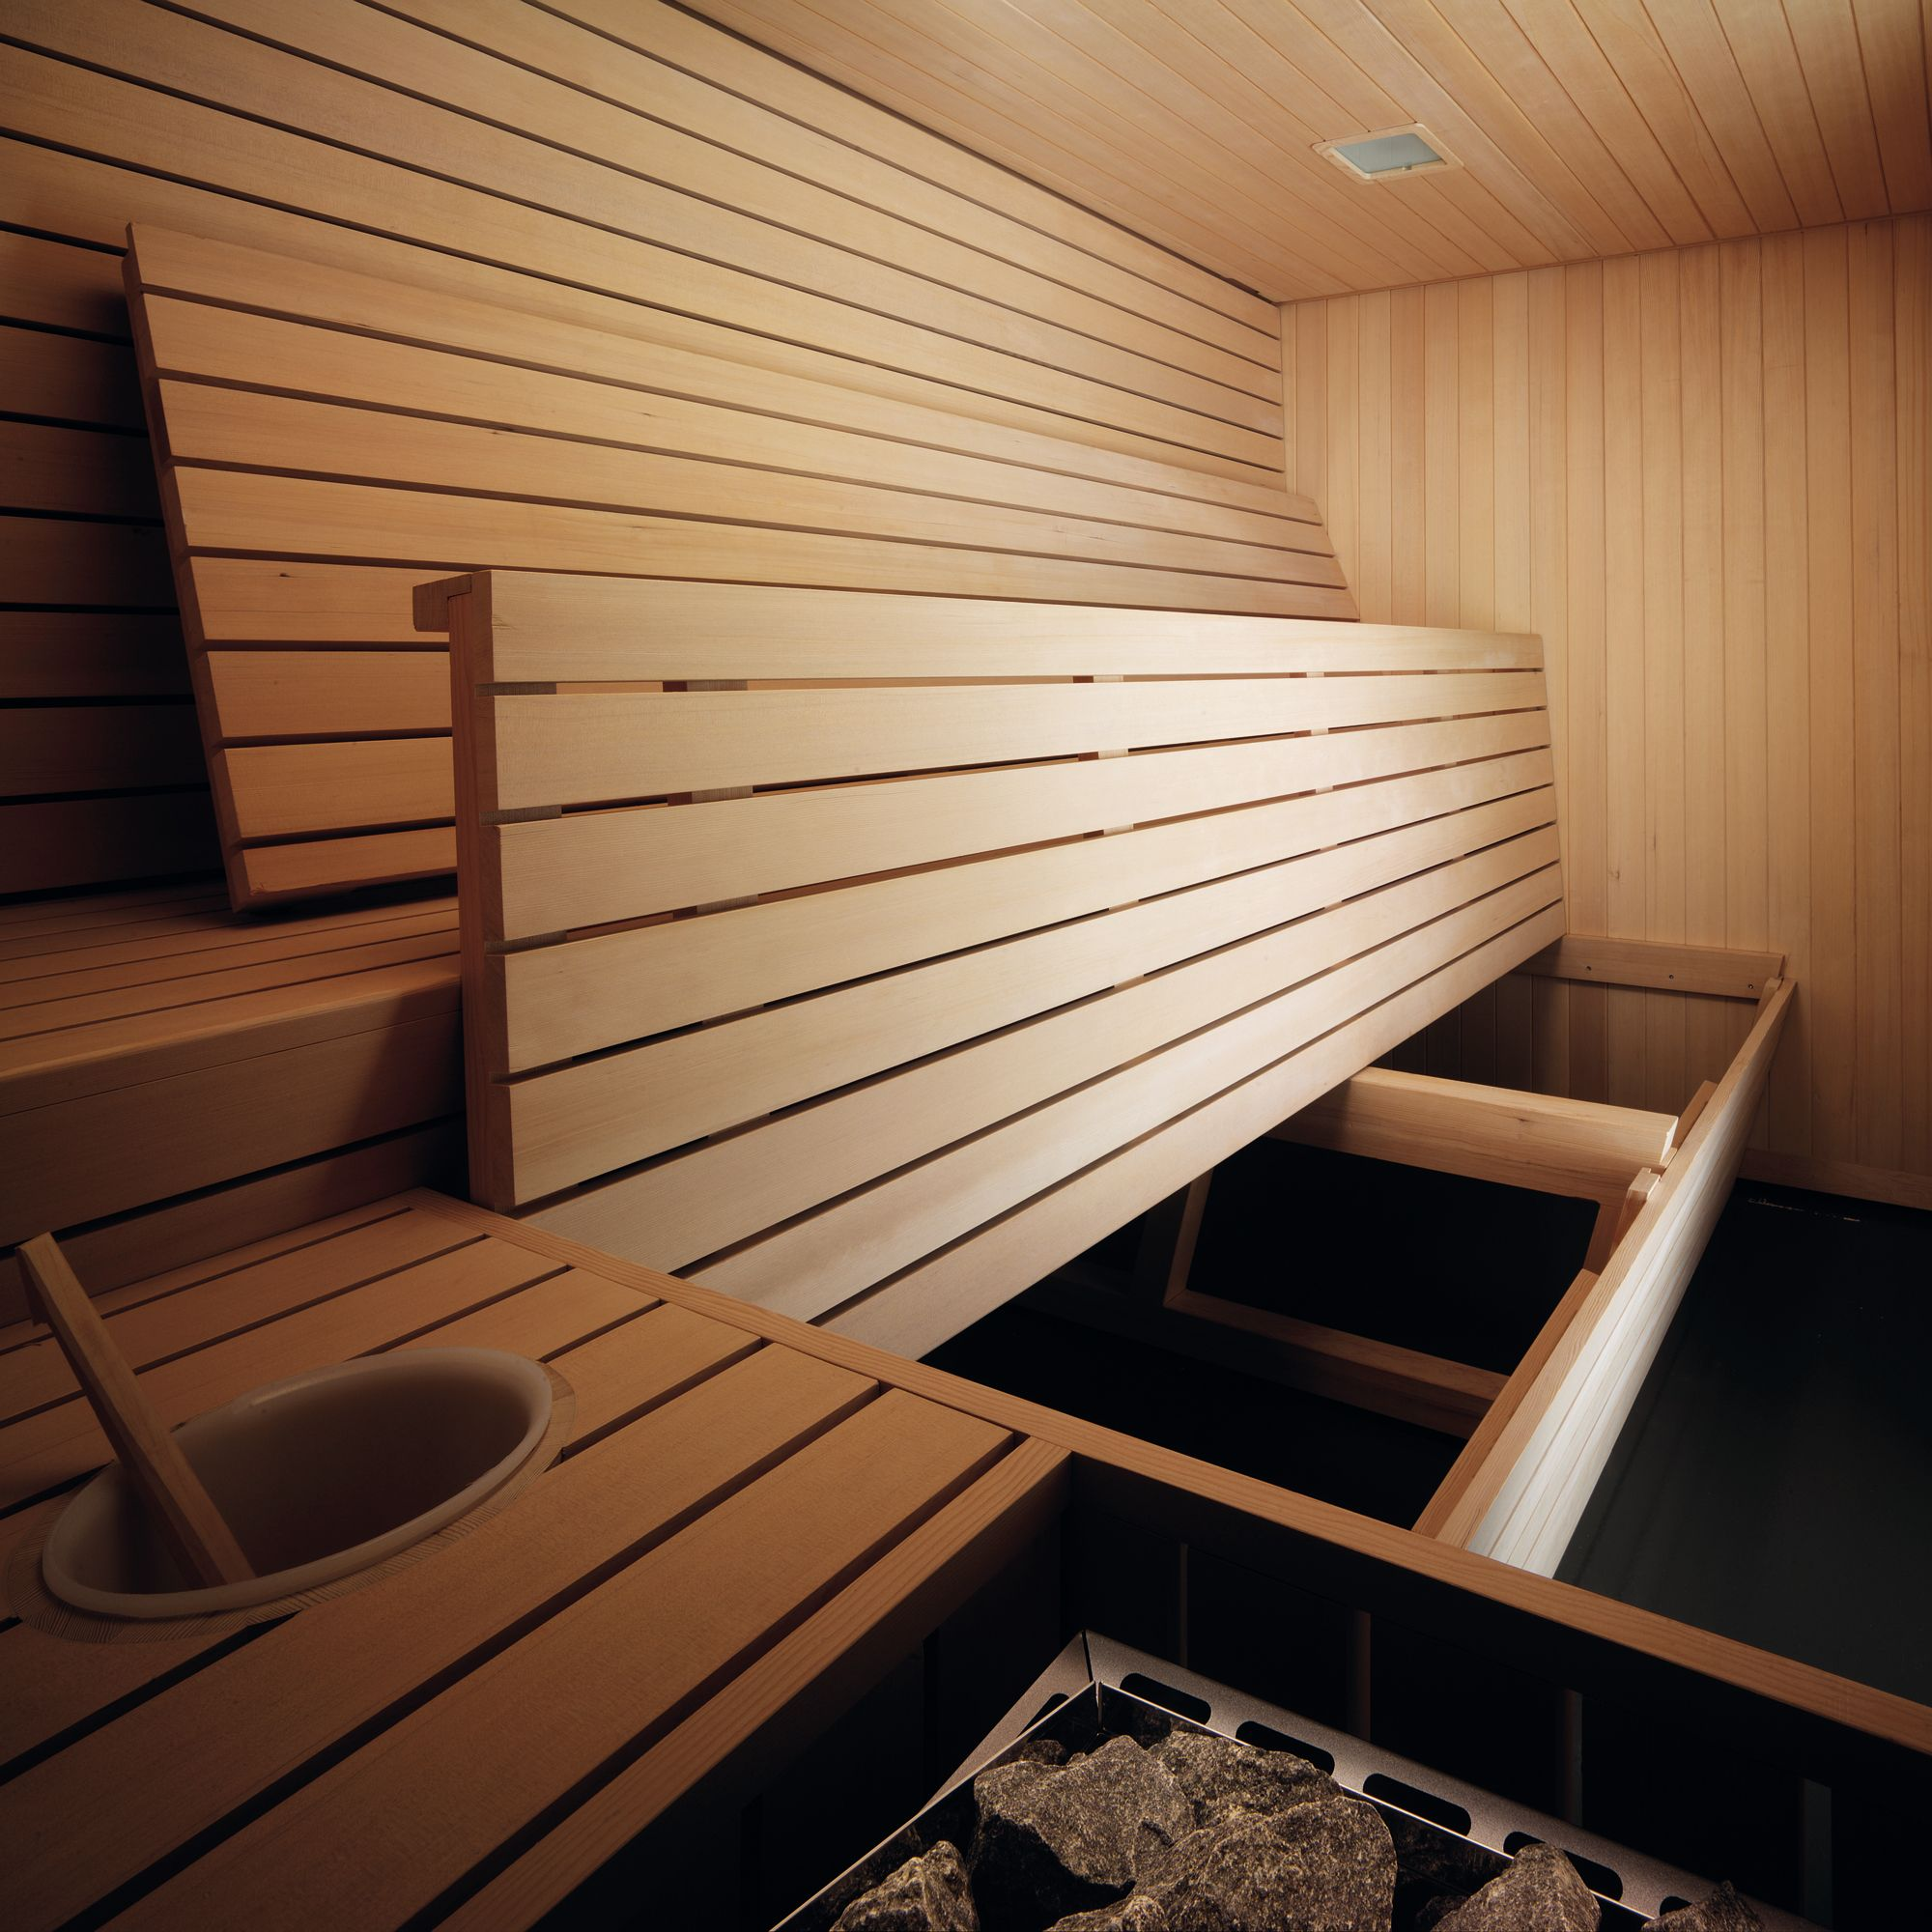 #Effegibi #Gym 250 #Bio Sauna Bi 60 25 0004 - On